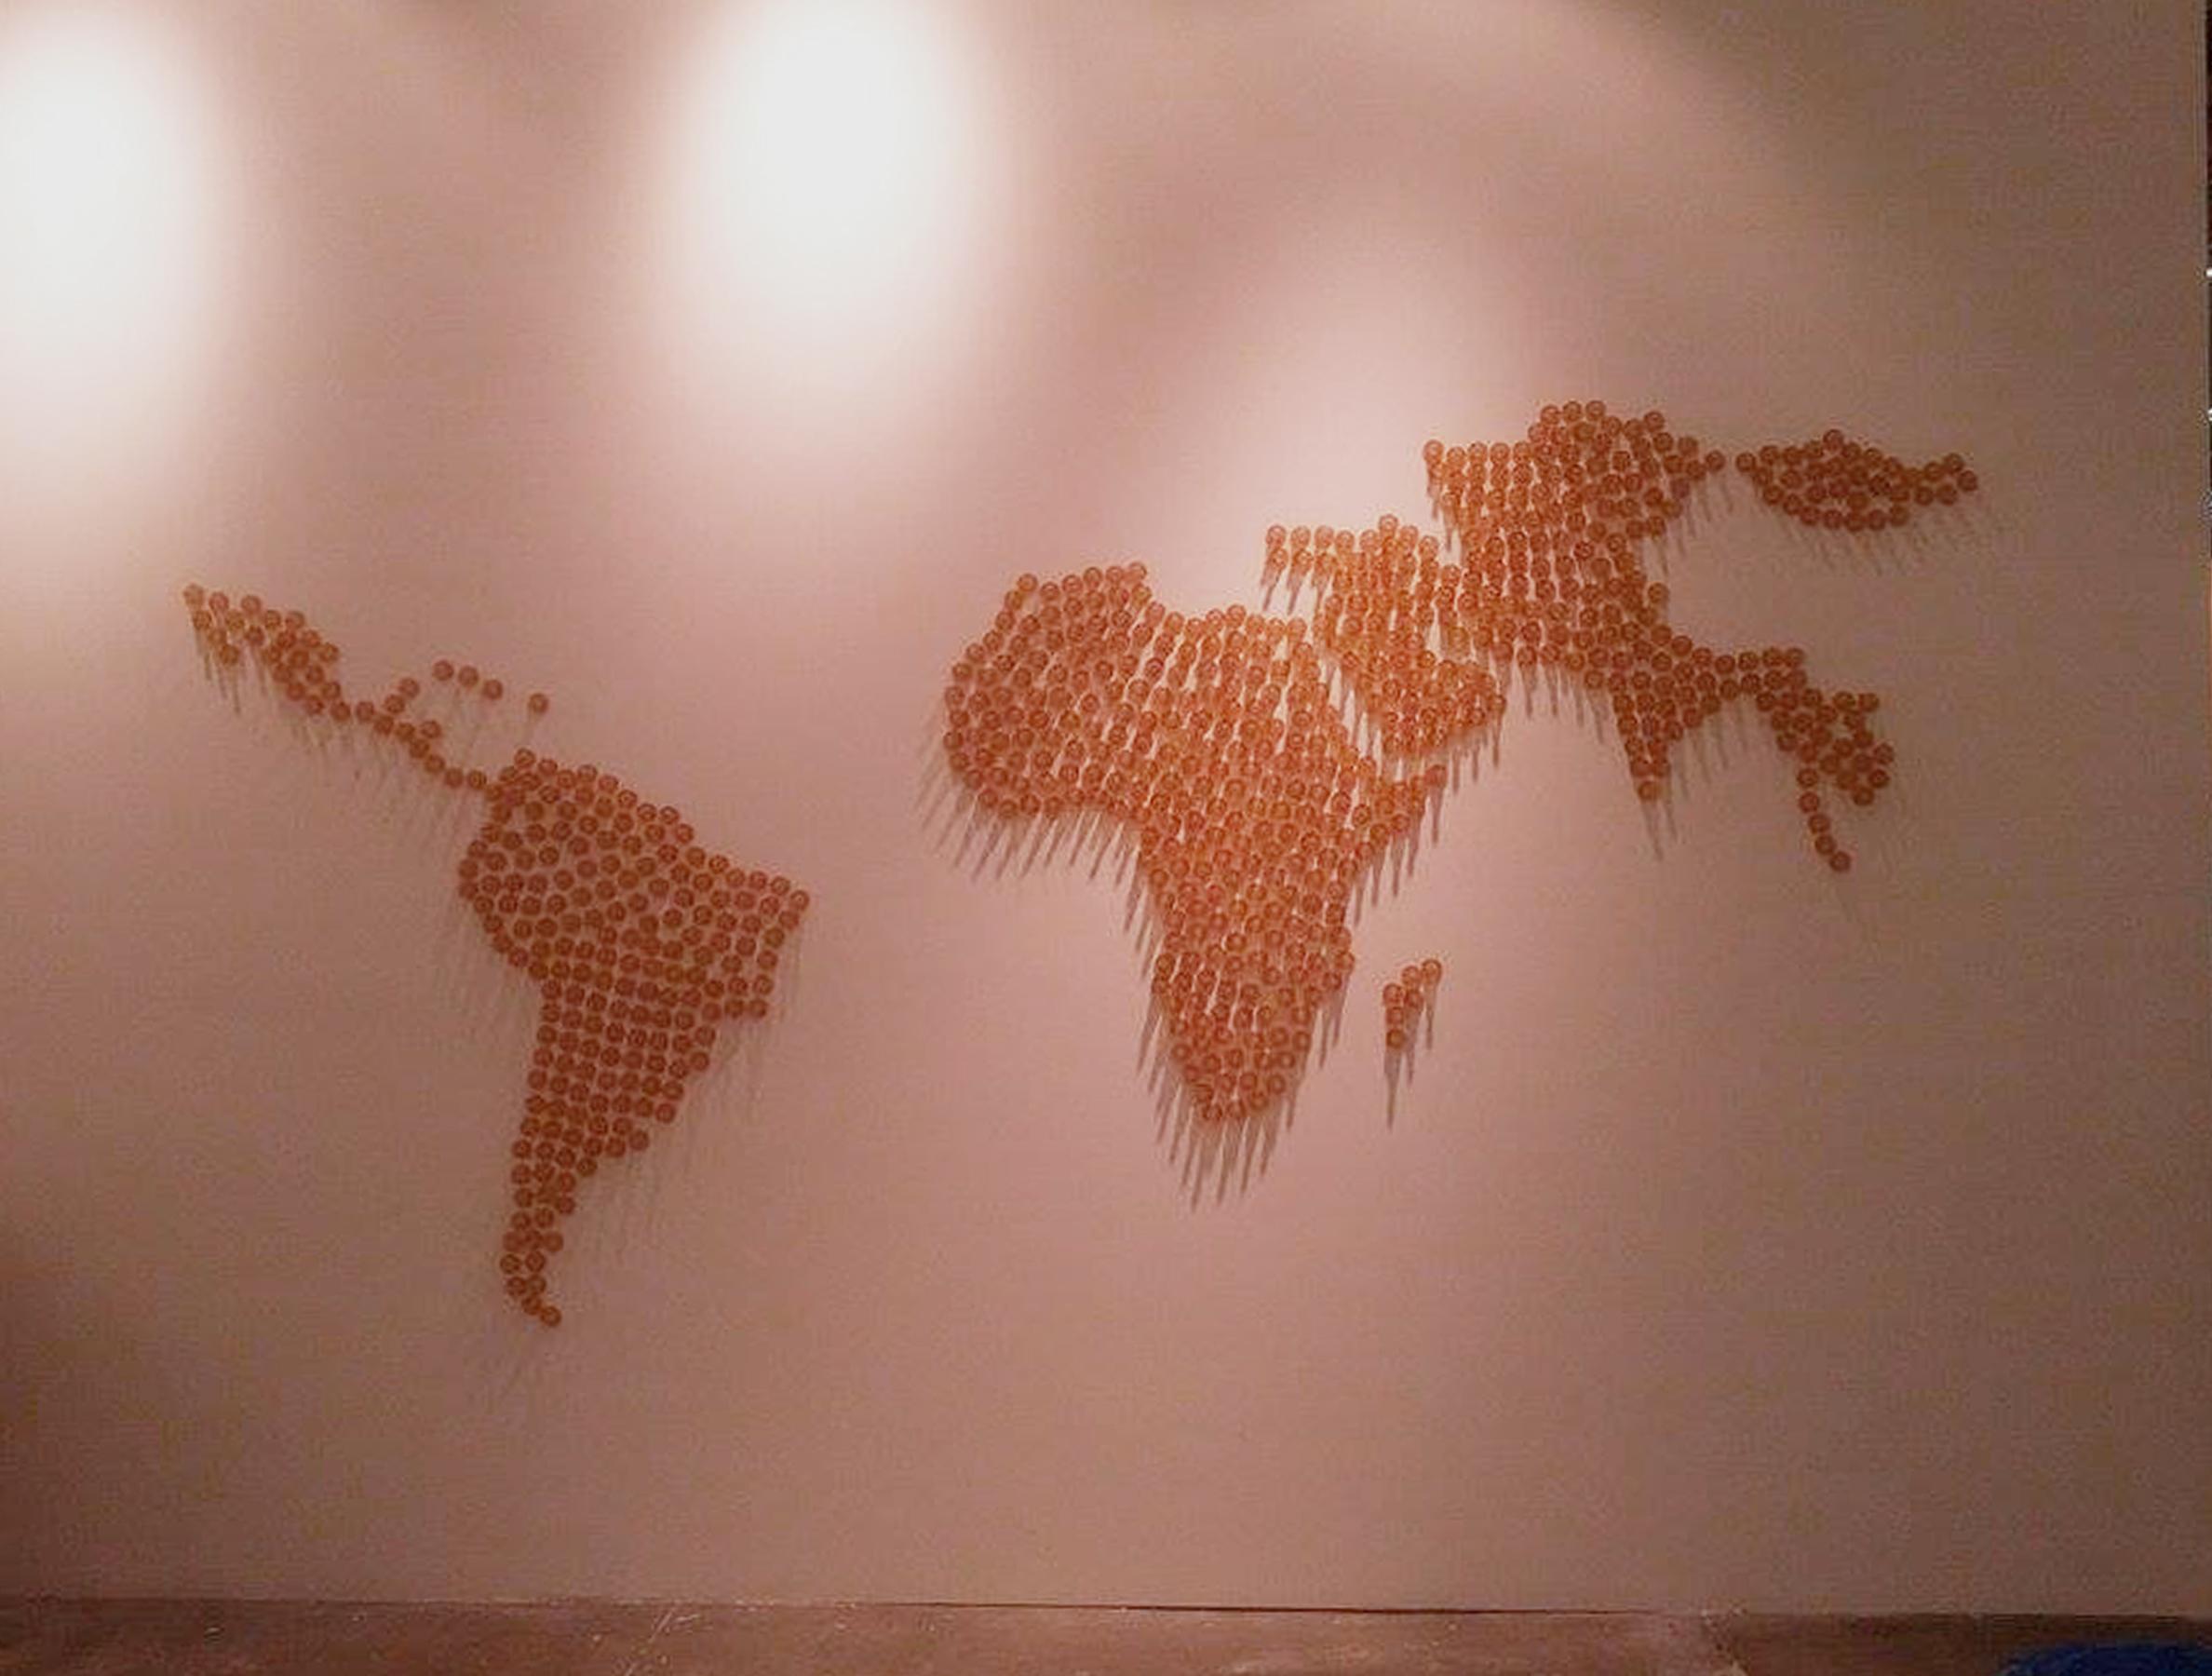 cartografia 72DPI